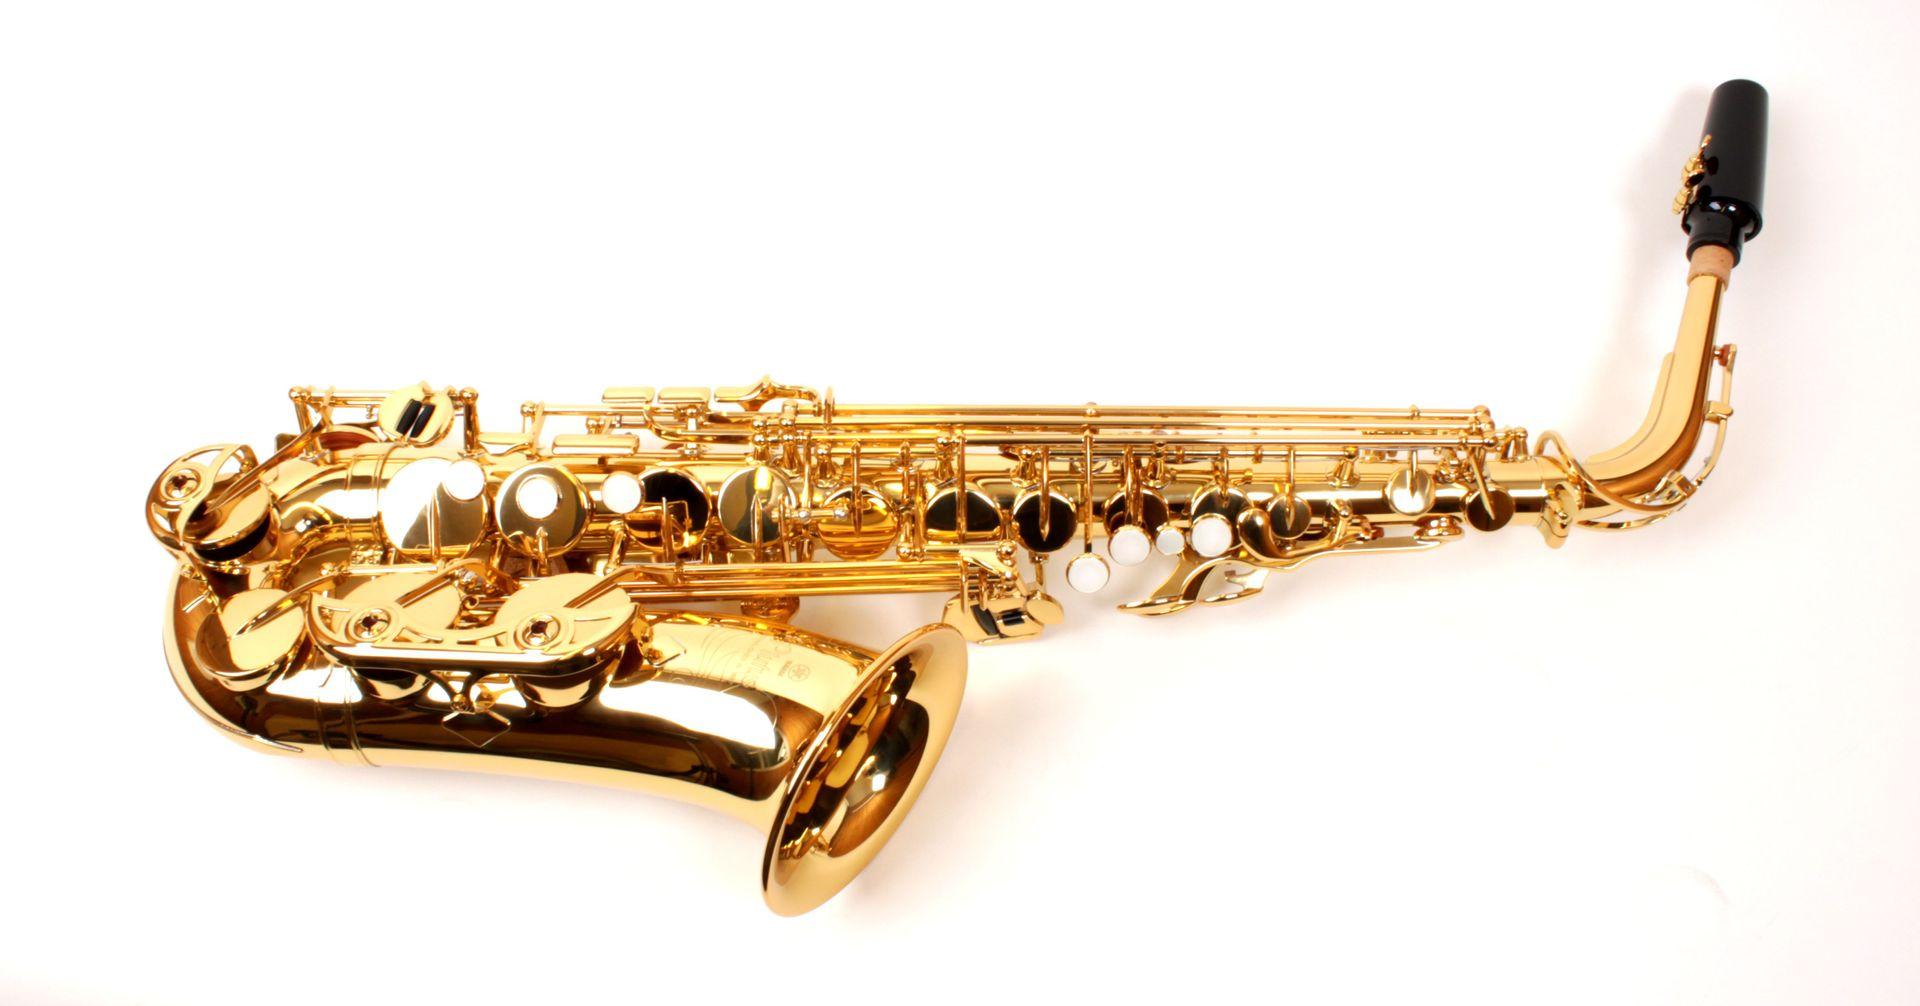 Yamaha PLUTUS YAS-PLU1 Altsaxophon, incl. Etui u. Zubehör